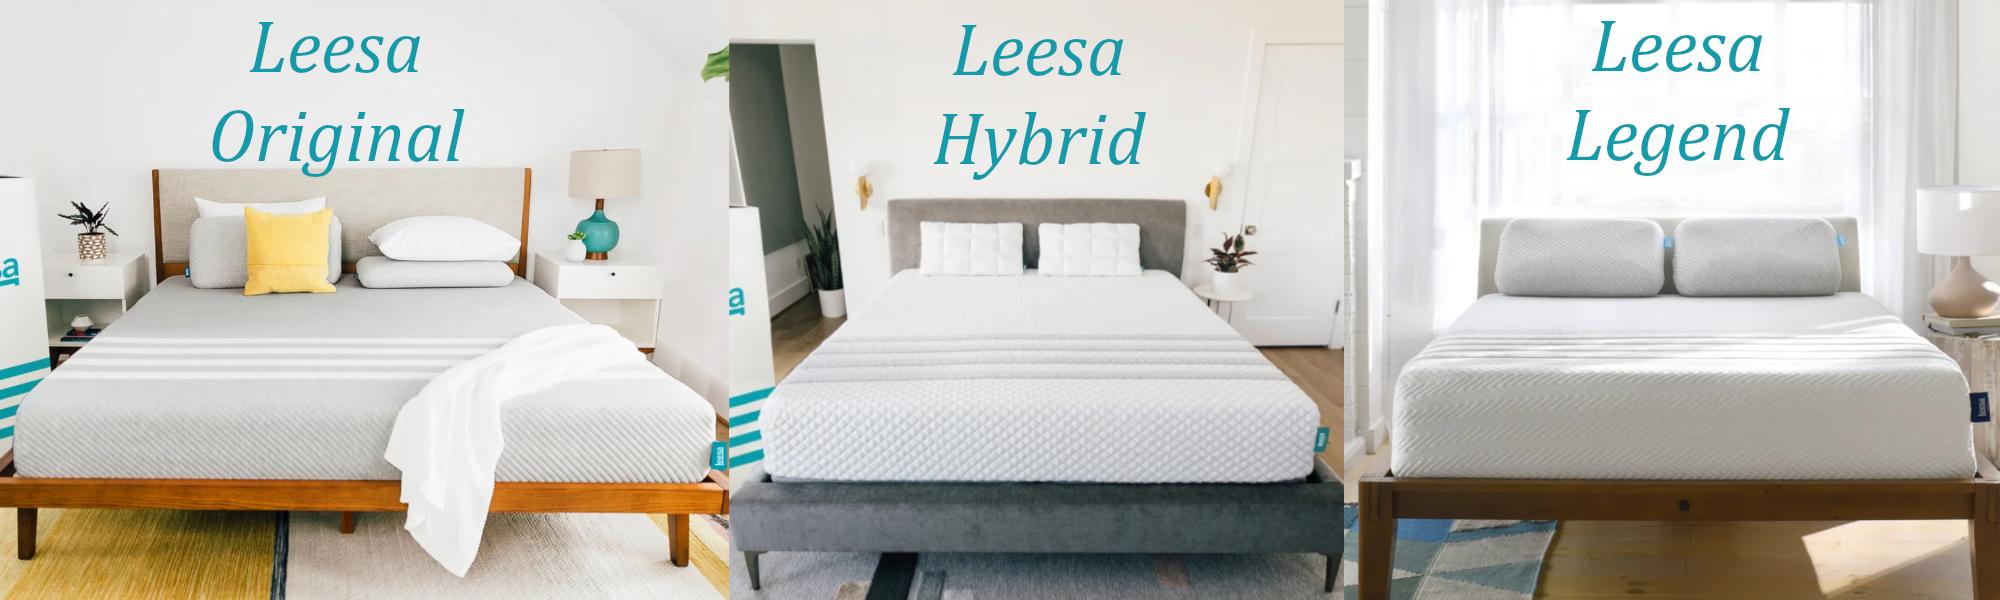 leesa brand mattresses comparison review